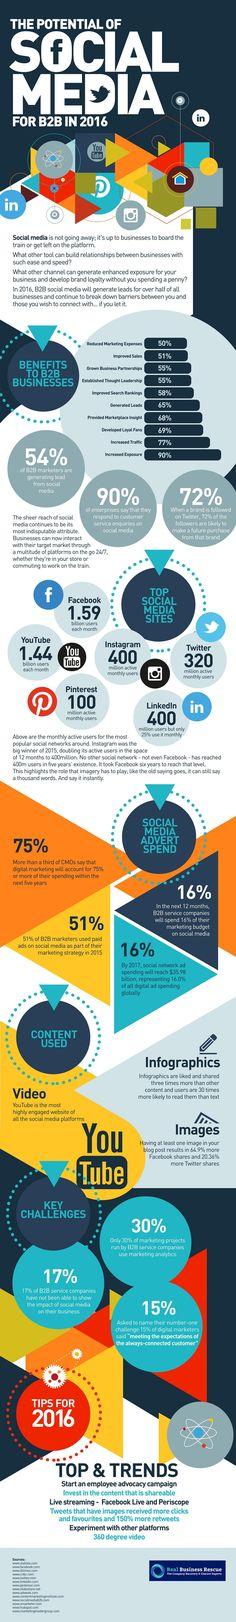 Das Potenzial von Social Media im B2B-Umfeld im Jahr 2016